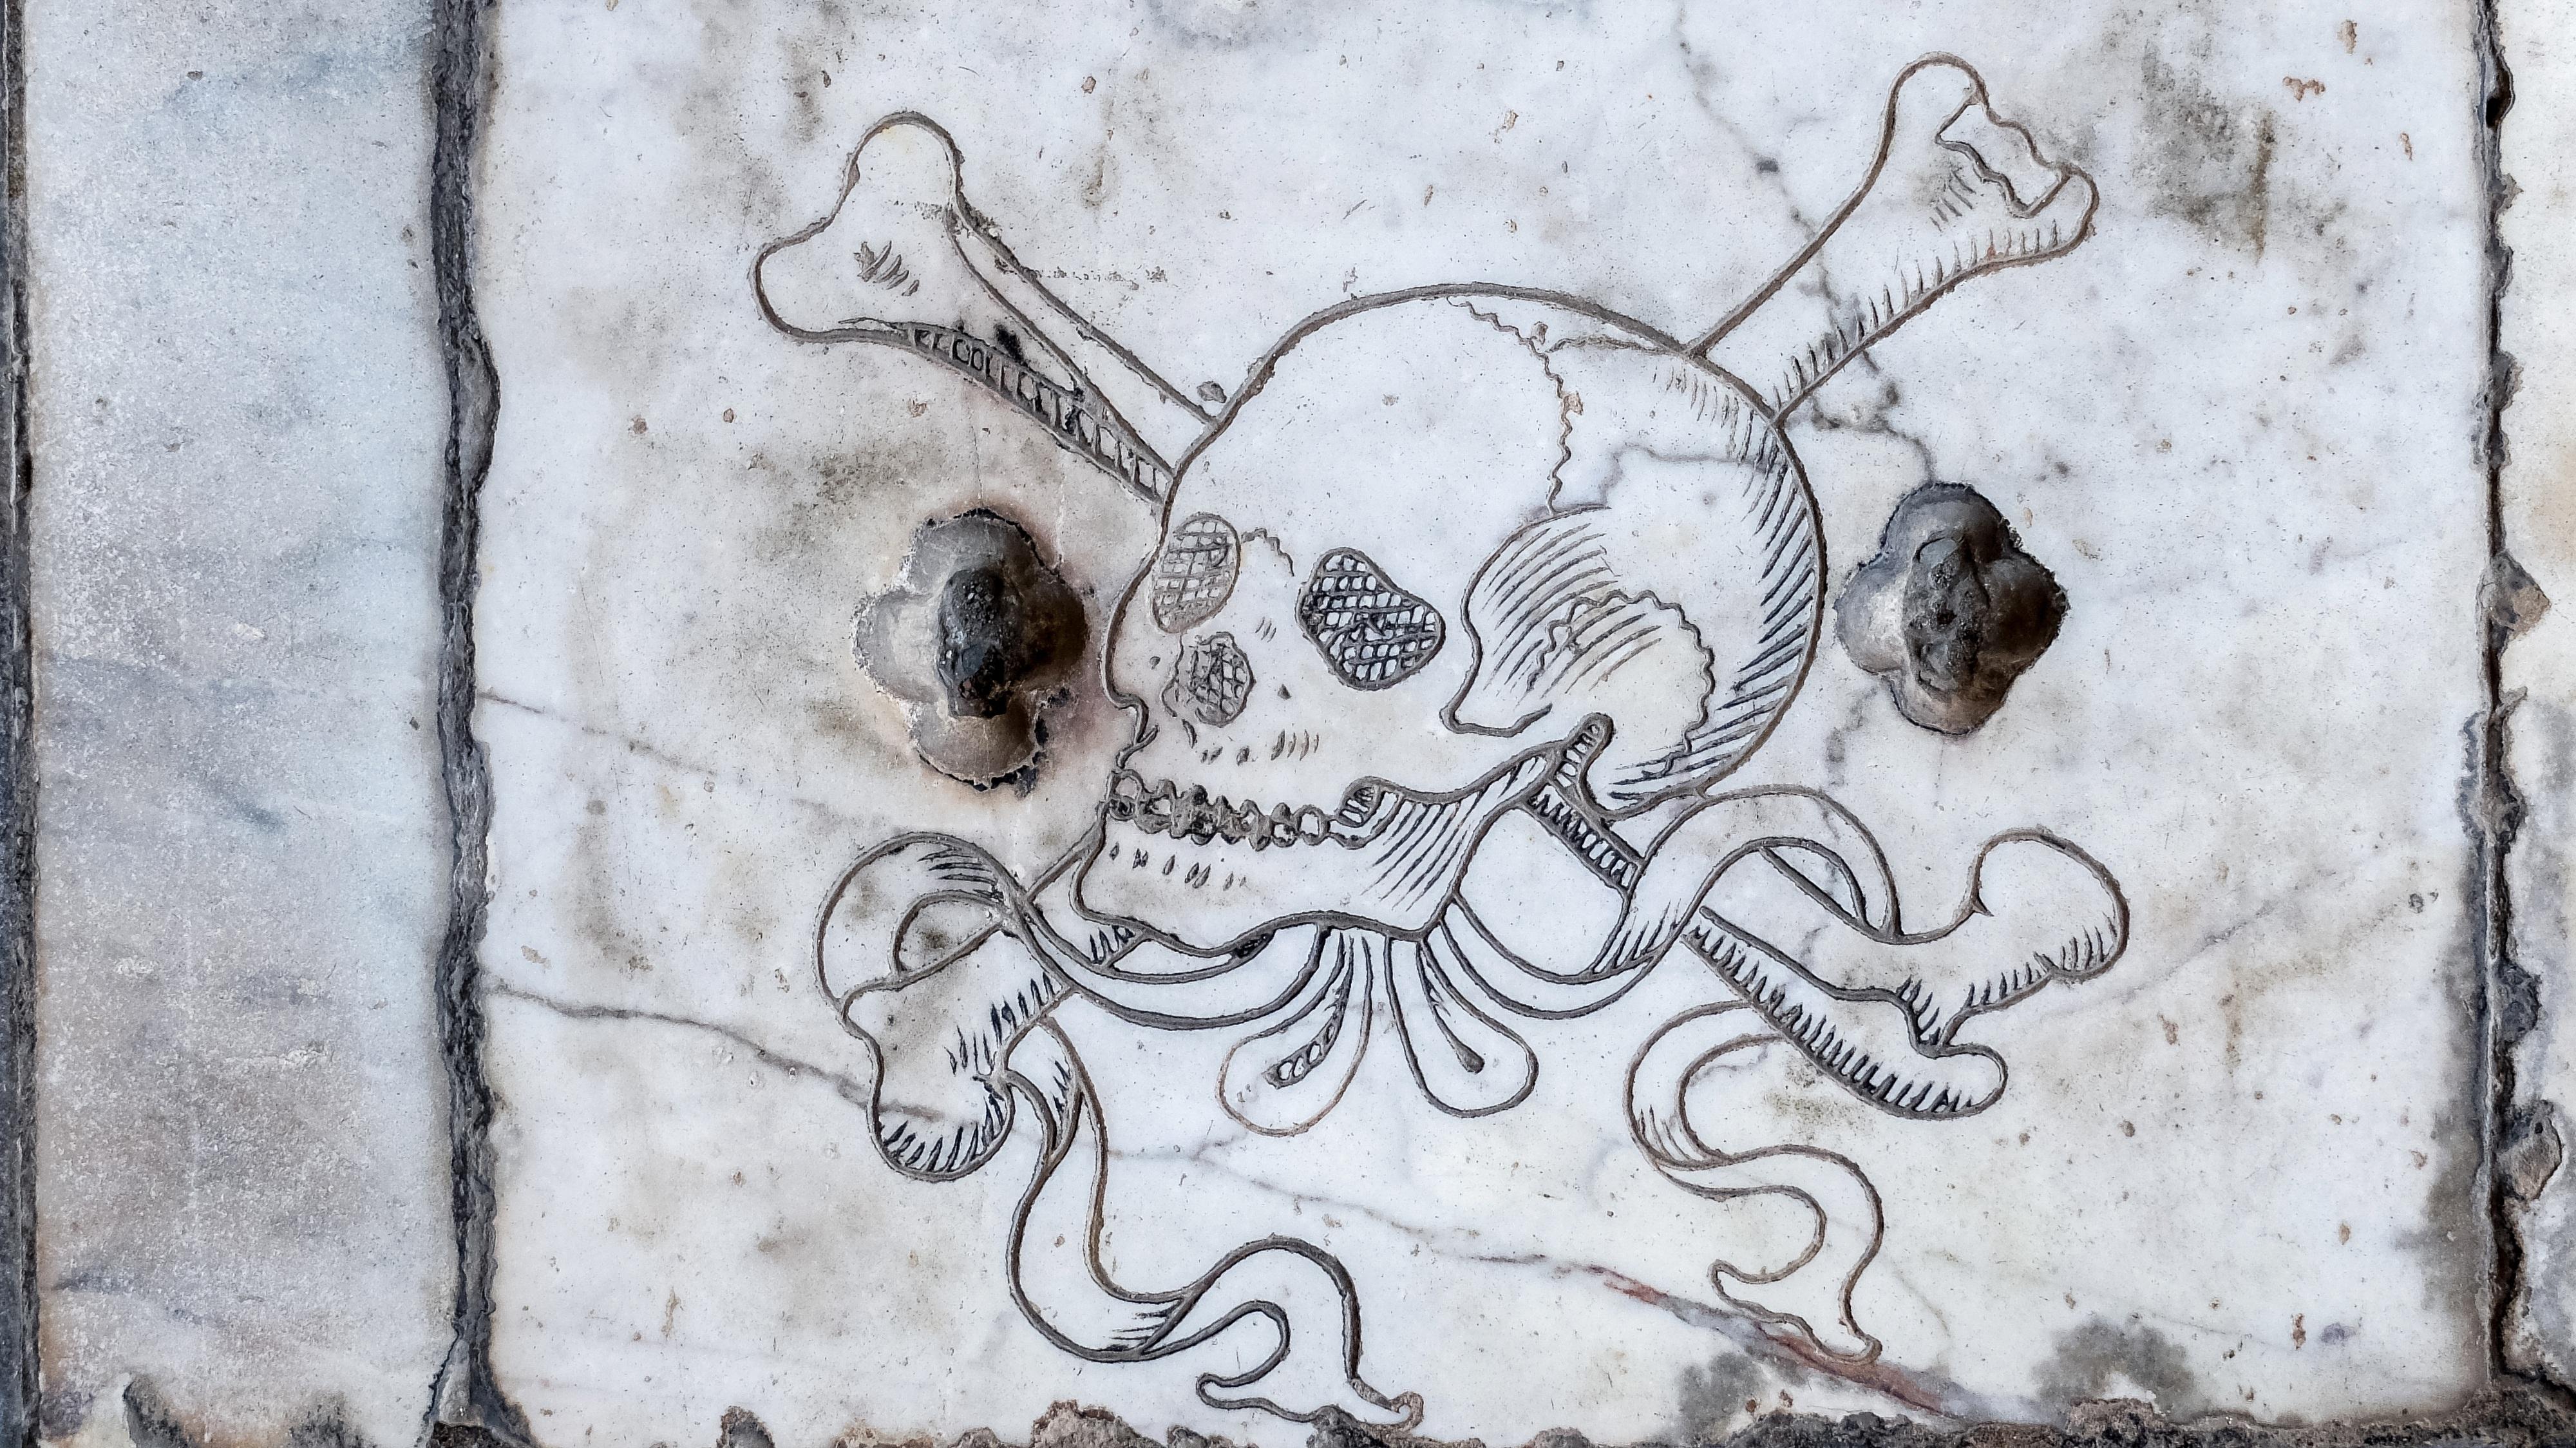 Free Wall Graffiti Skull Street Art Sketch